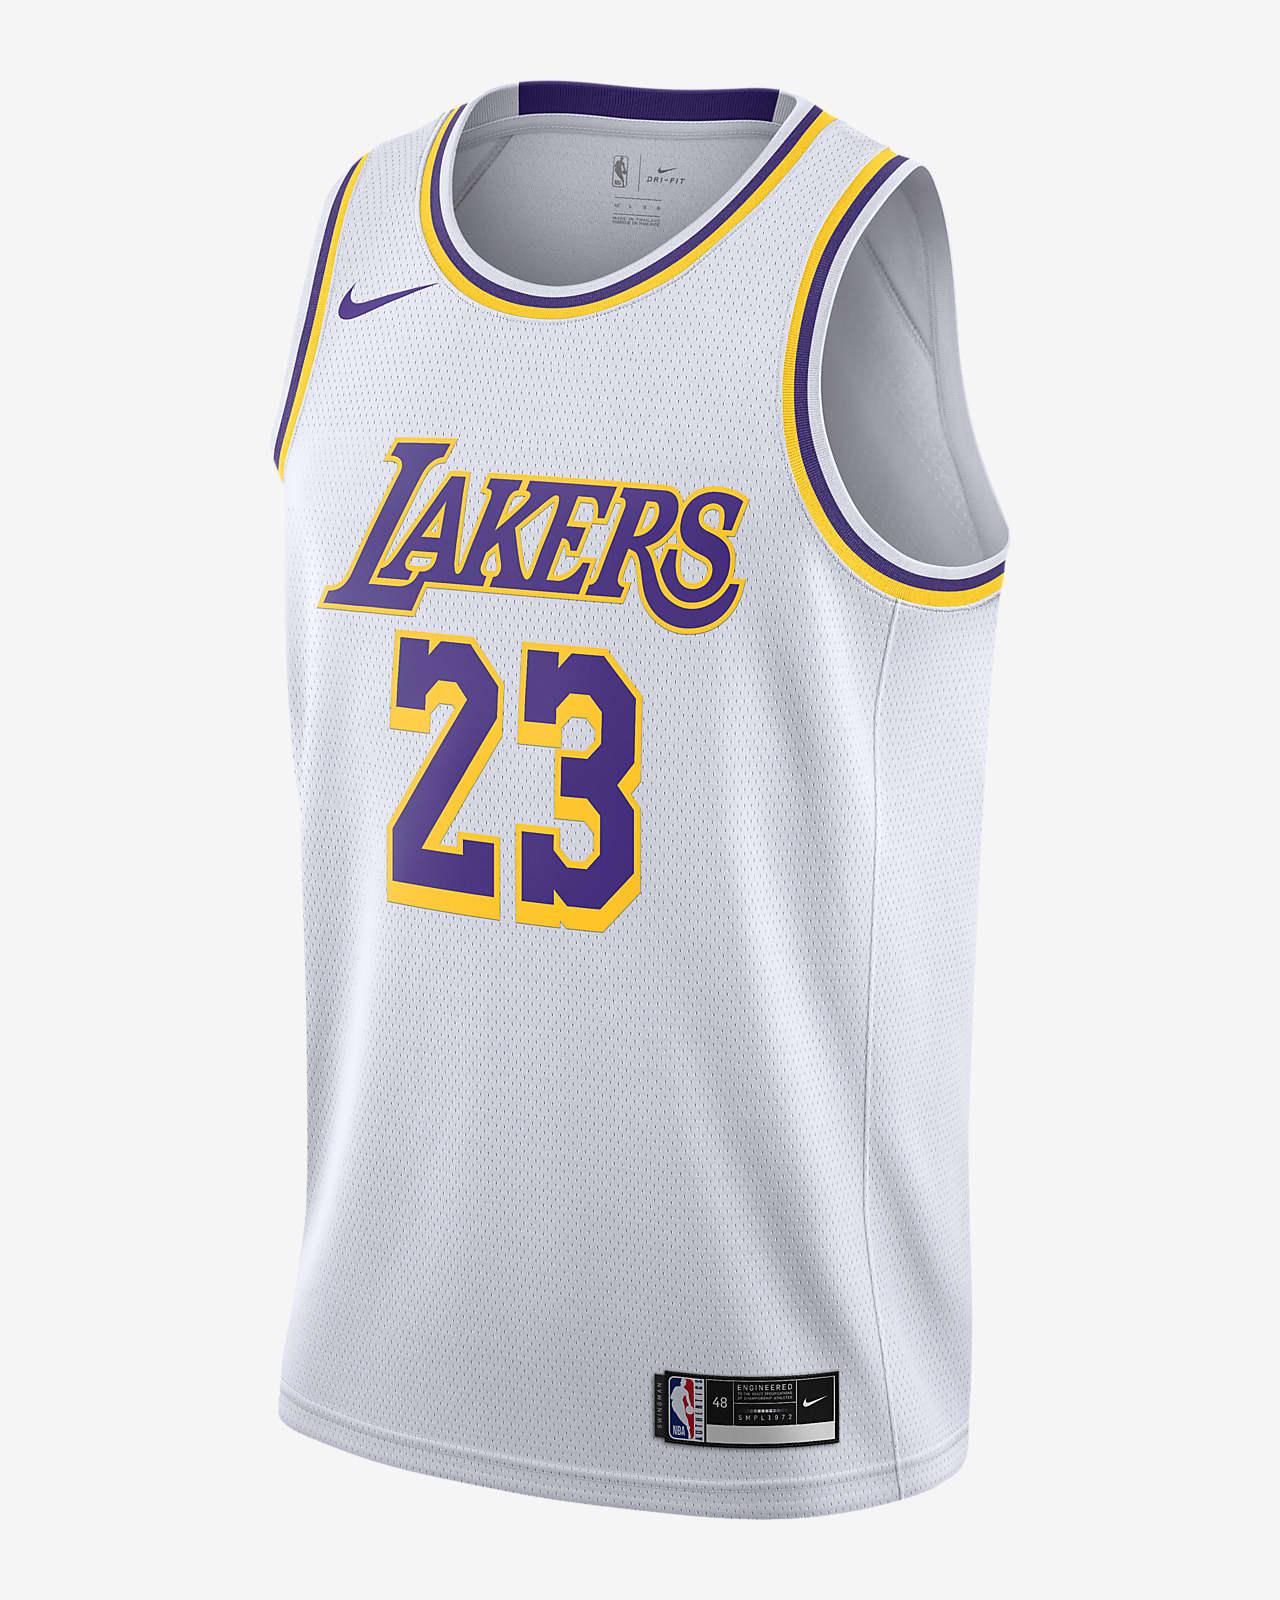 LeBron James Lake Association Edition 2020 Nike NBA Swingman Jersey